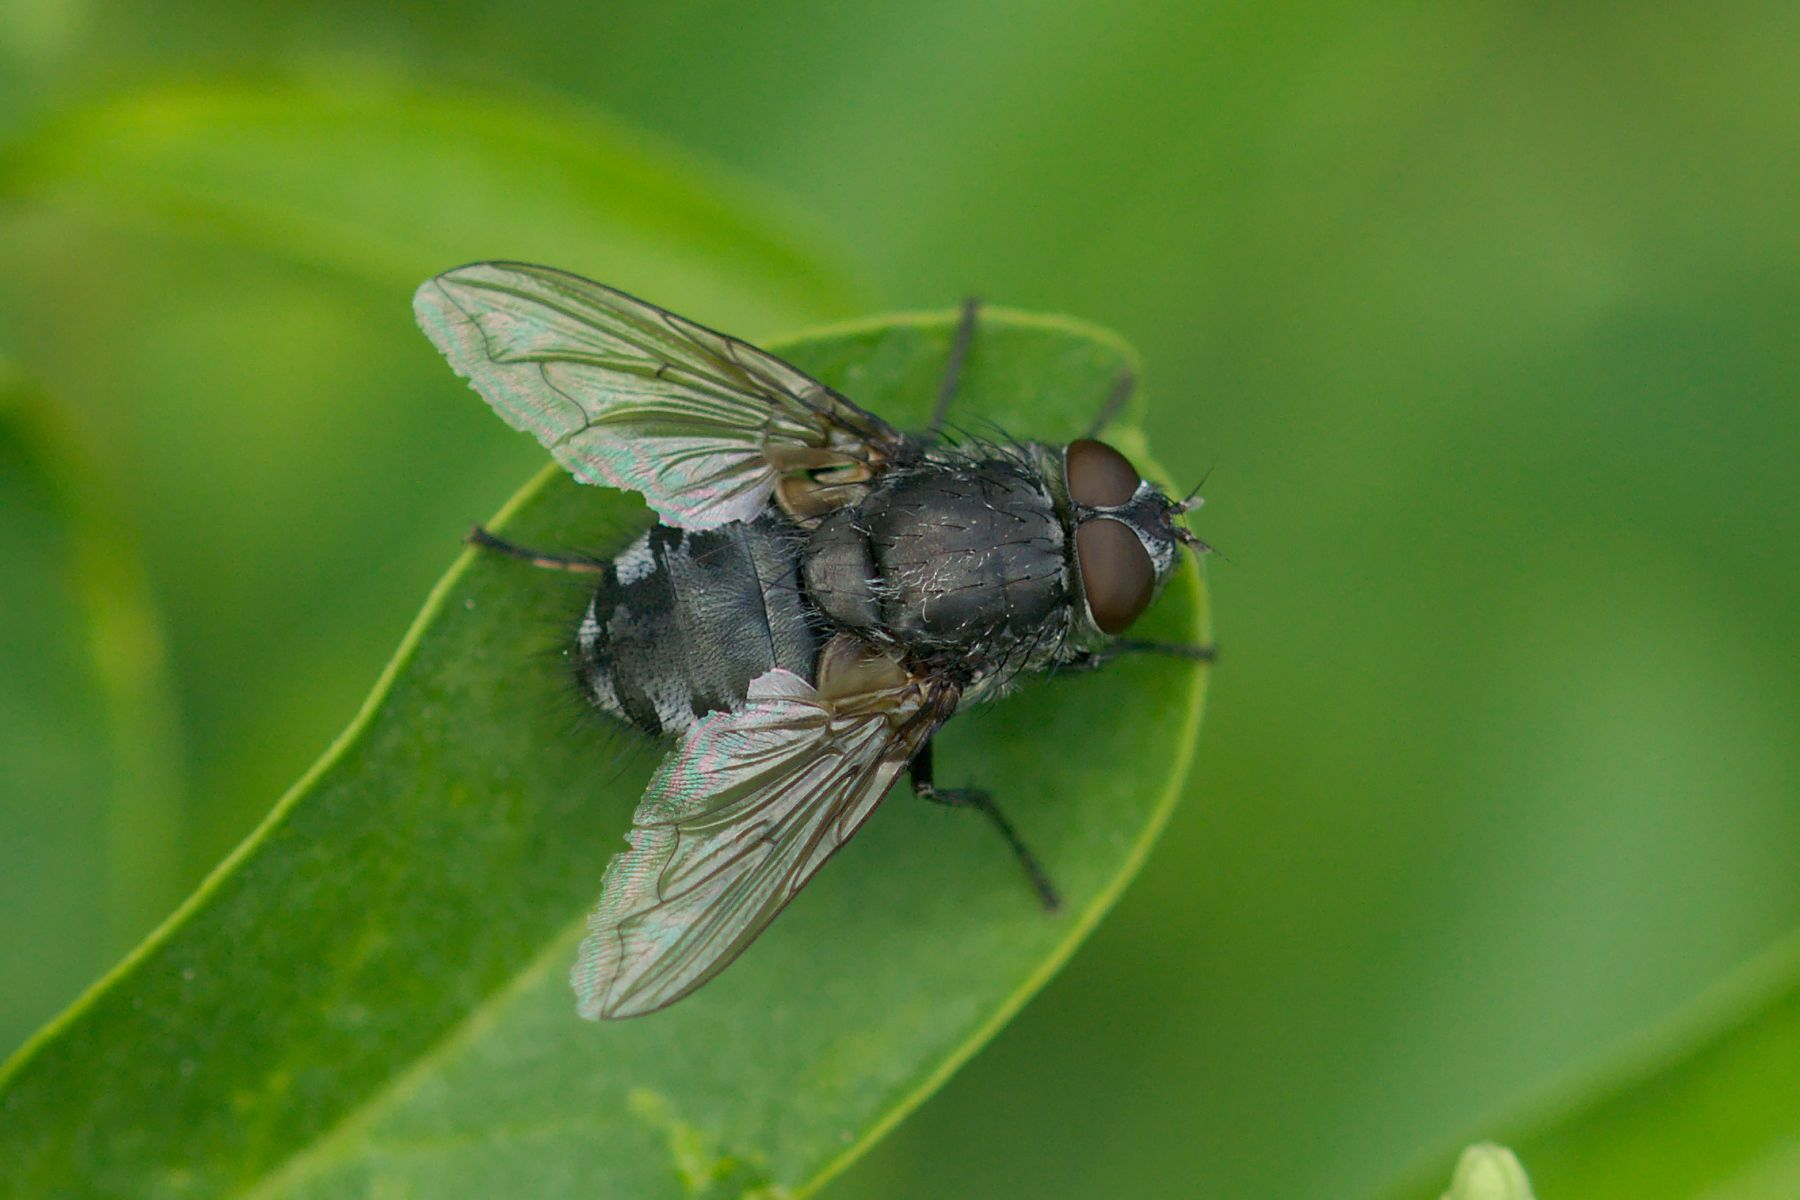 "<a href=""/pollenia-sp/"" target=""_blank"" rel=""noopener noreferrer""><i>Pollenia</i> sp. (Schmeißfliege)</a>"